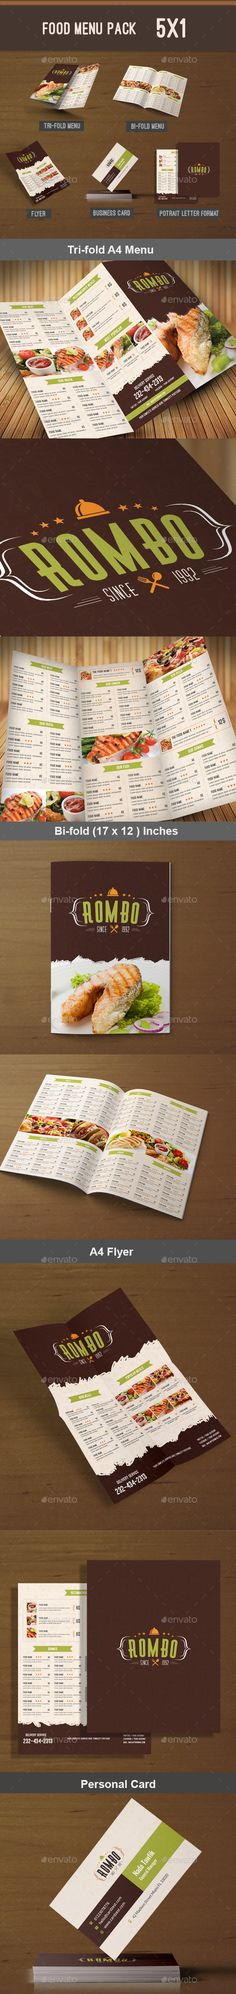 Food Menu Pack Template PSD #design Download: http://graphicriver.net/item/food-menu-pack-1/13638517?ref=ksioks